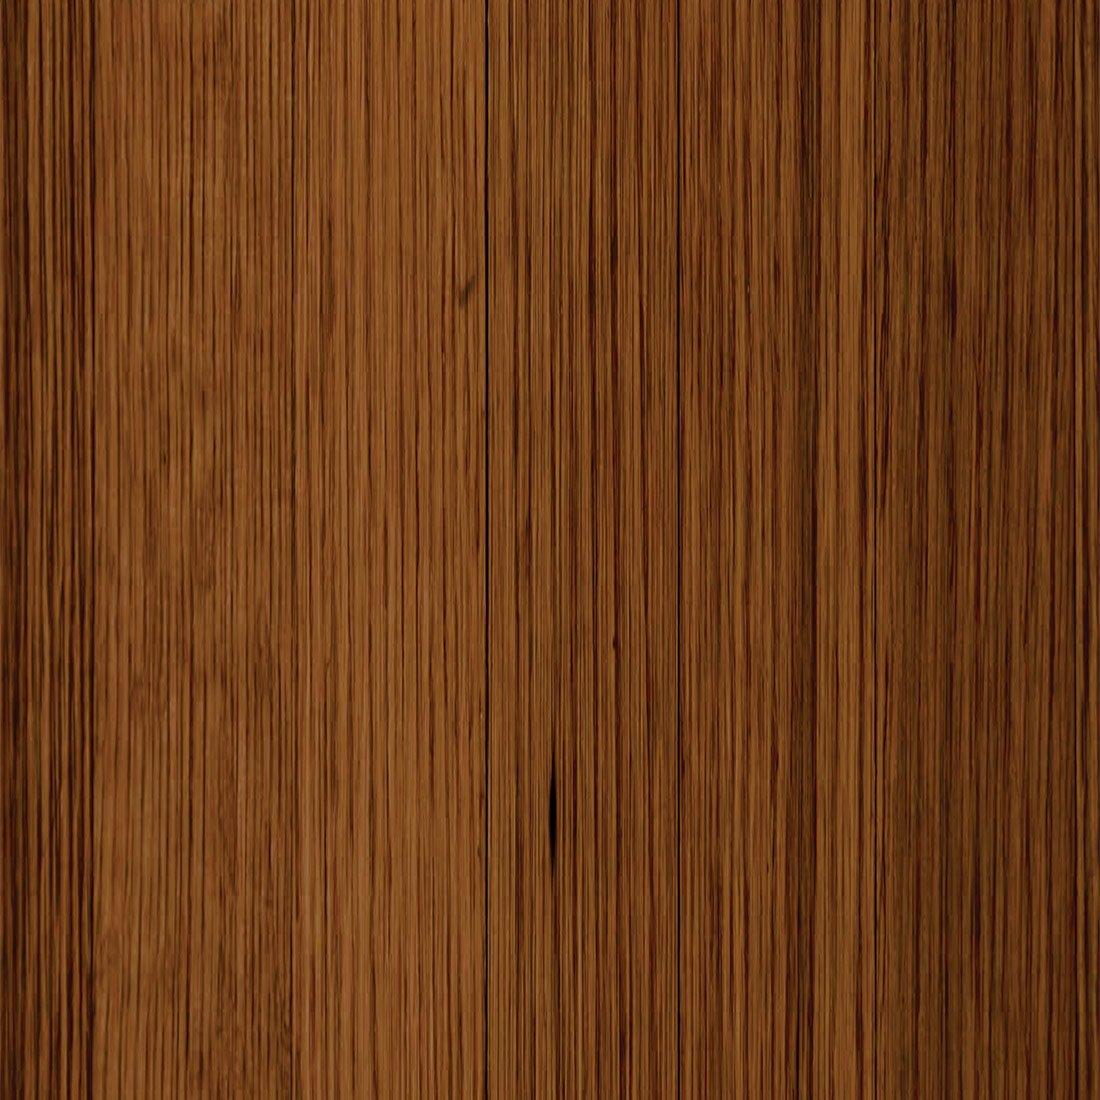 papel de parede estilo madeira jacarand jmi decor elo7